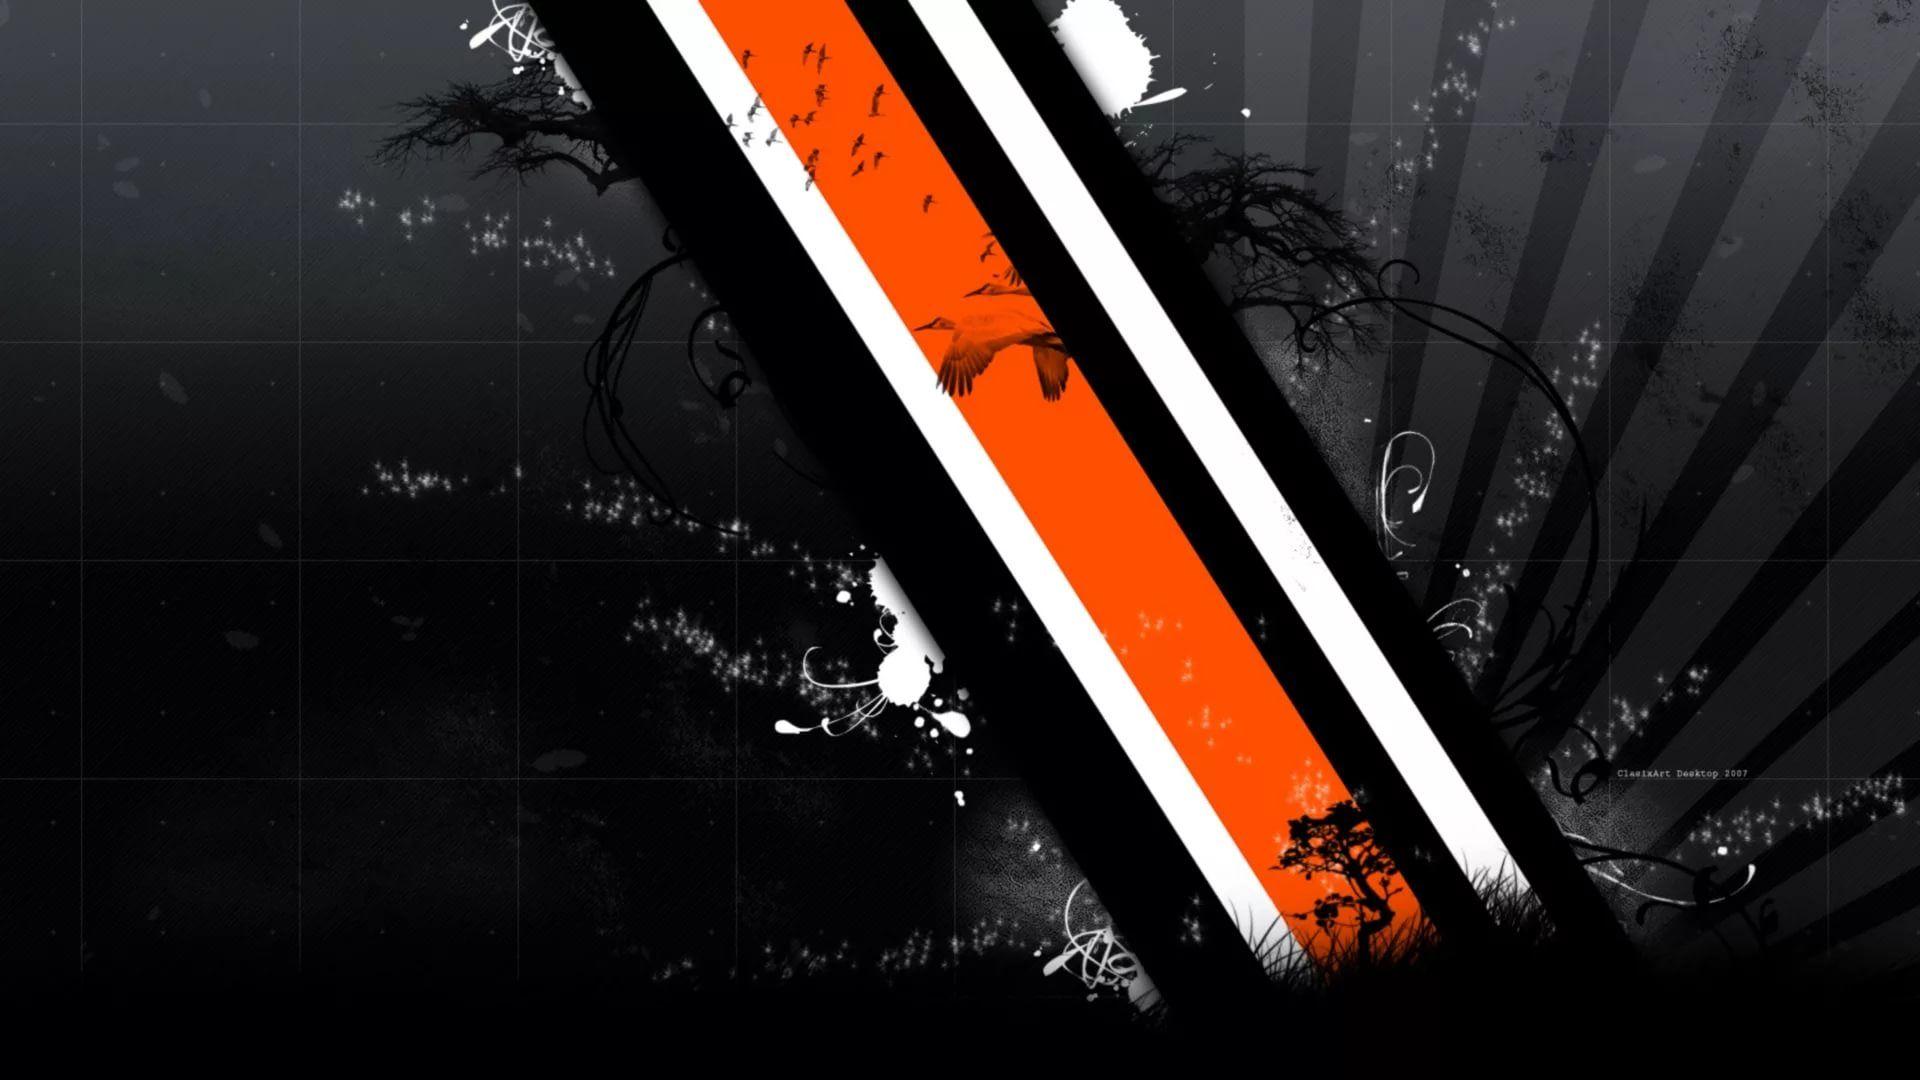 Black And Orange Picture